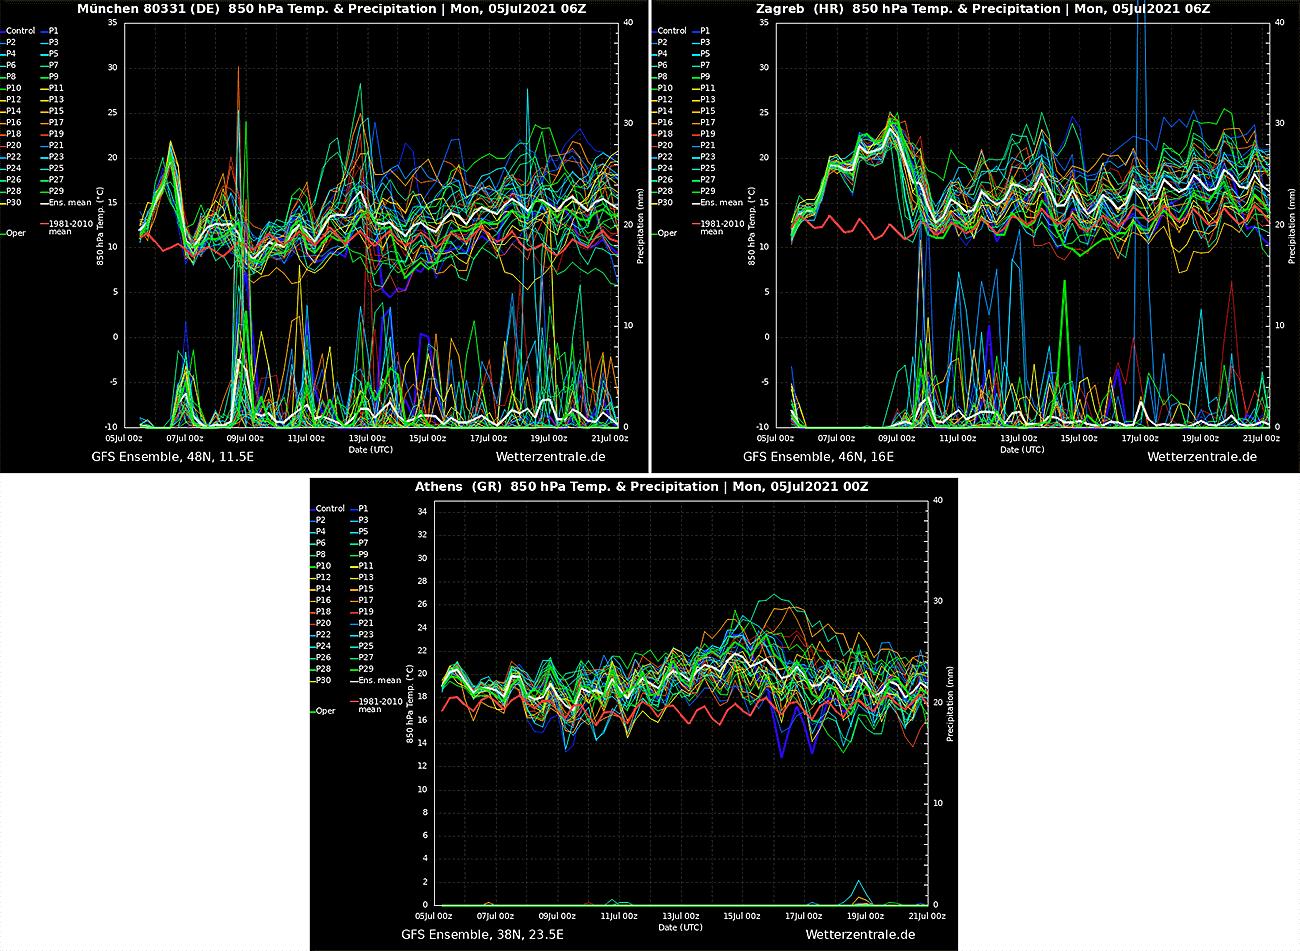 another-intense-heatwave-central-europe-balkan-peninsula-meteograms